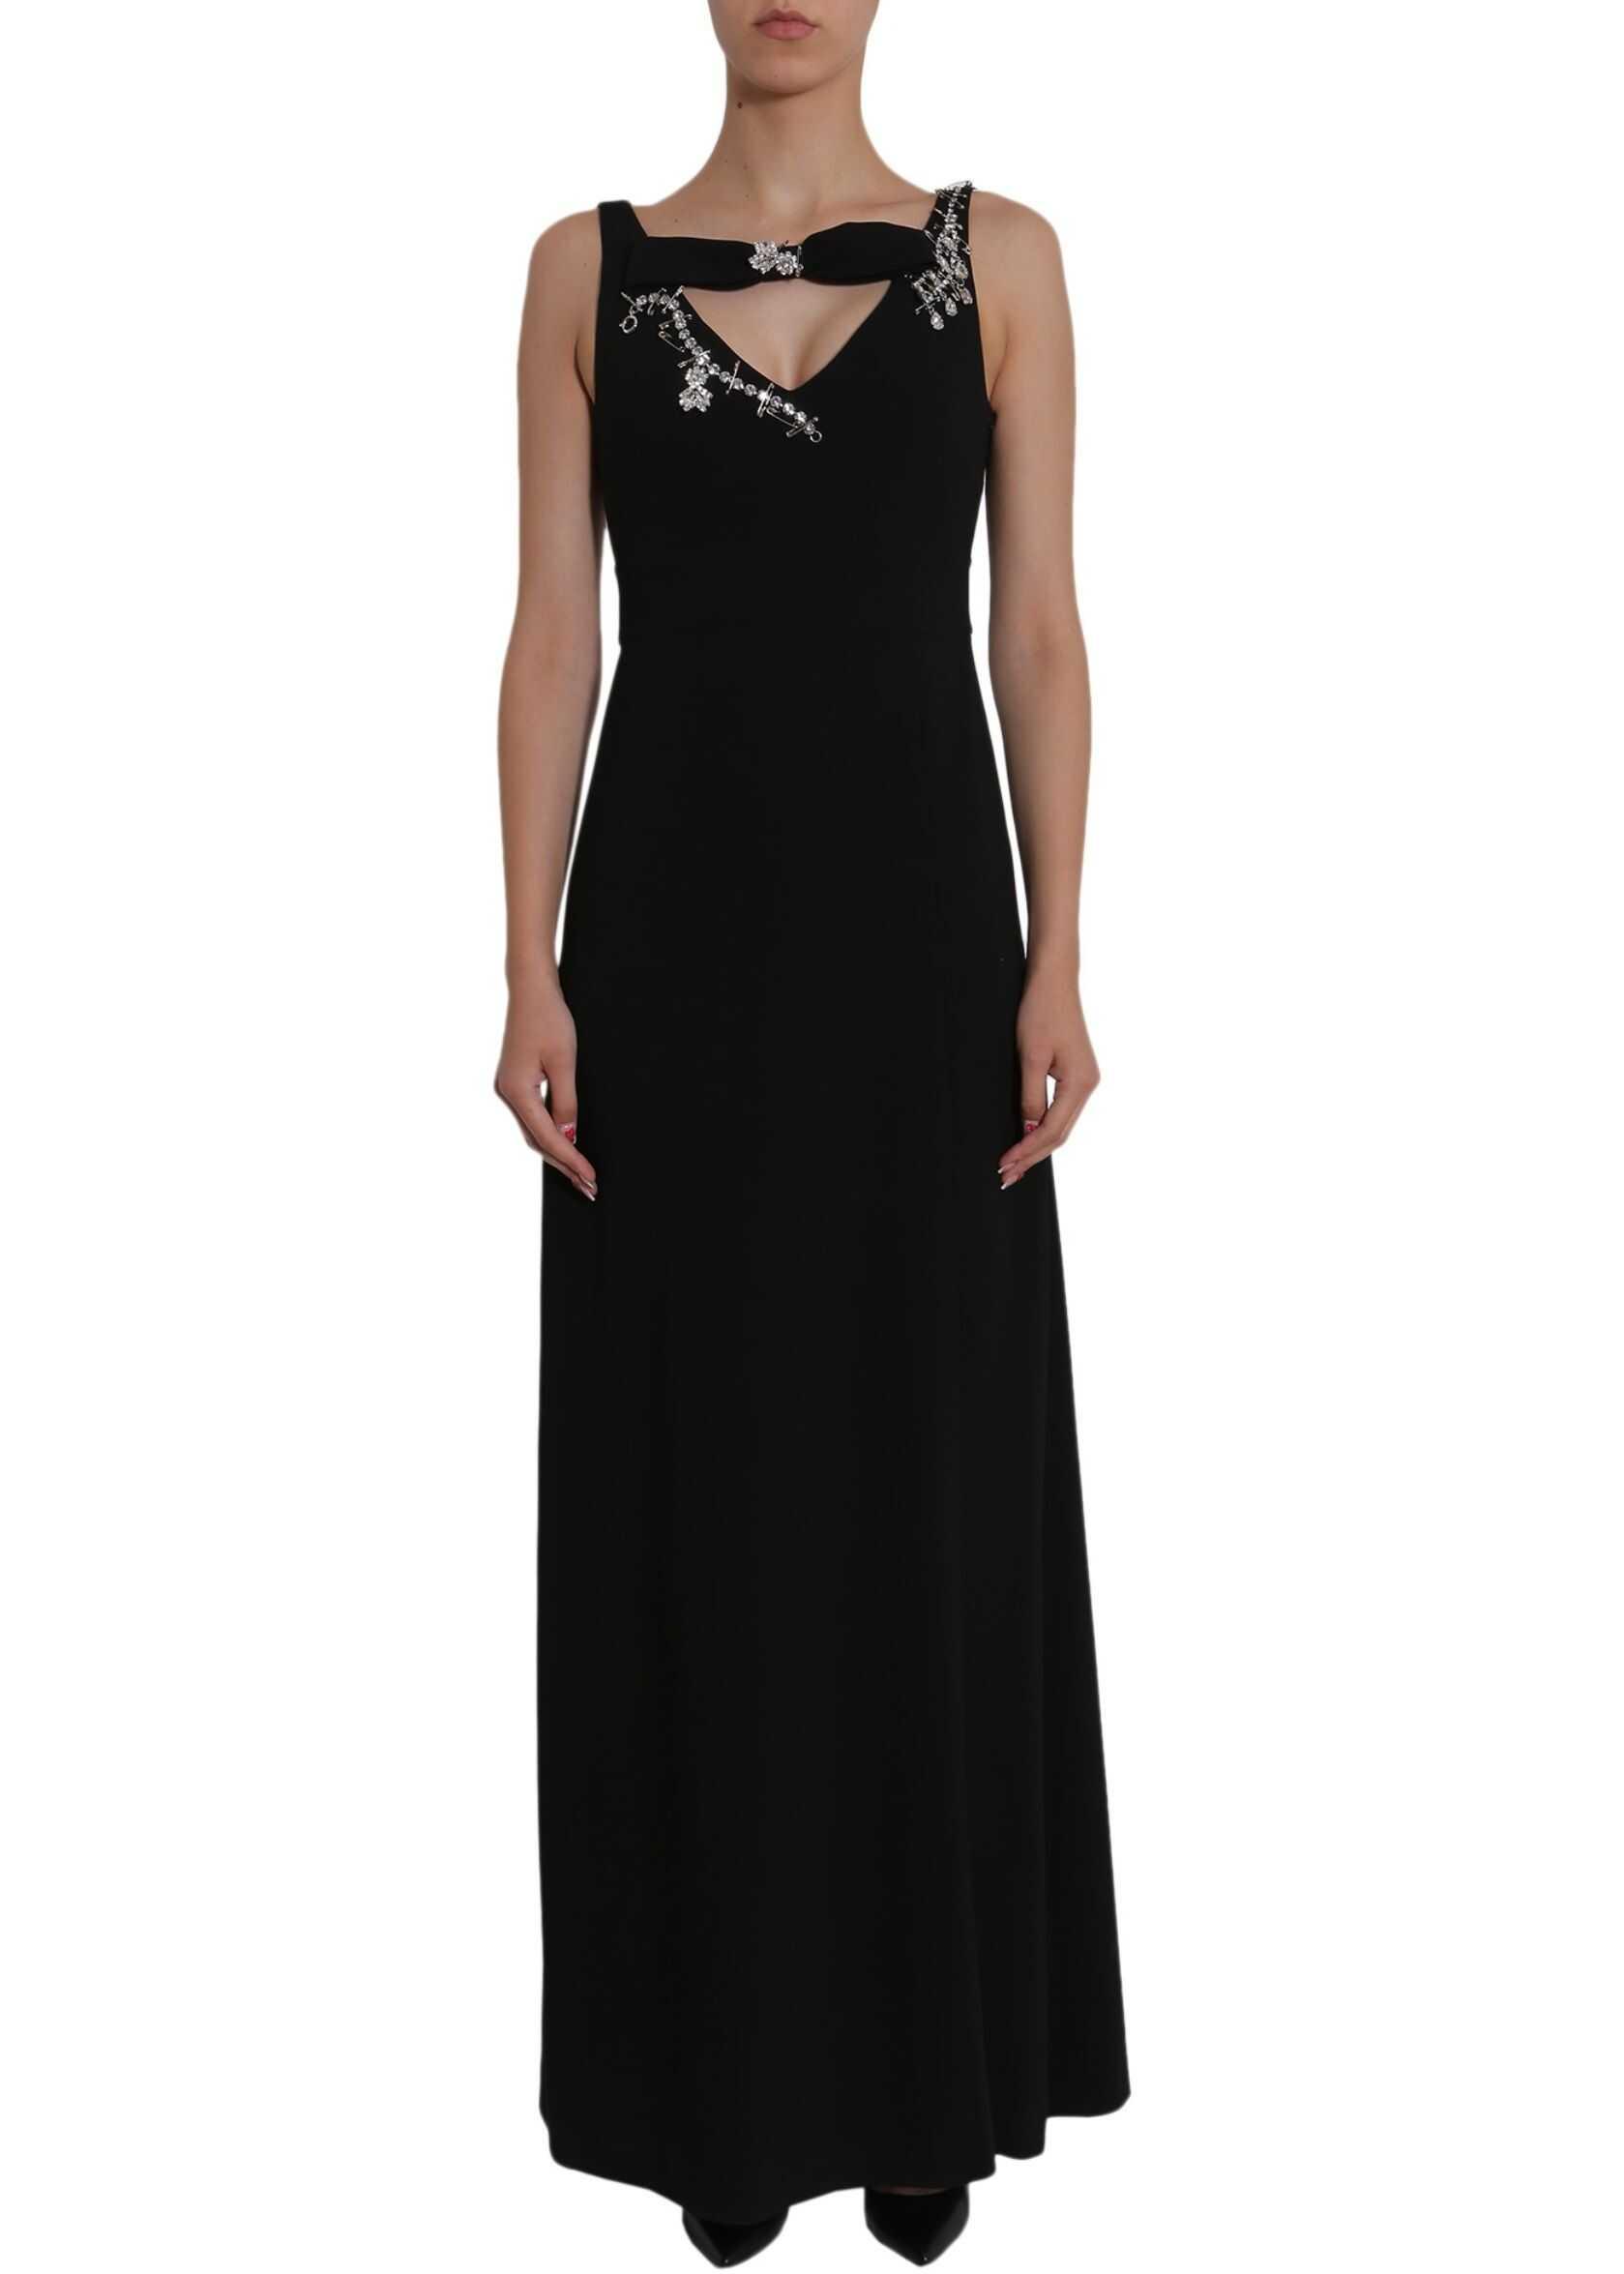 LOVE Moschino Embellished Dress BLACK